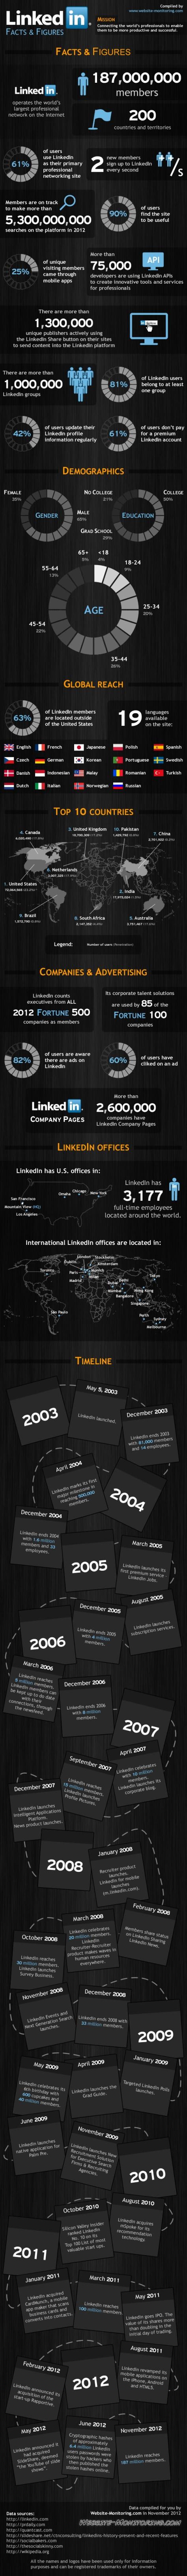 linkedin-facts--figures_50c73d7a2c69d